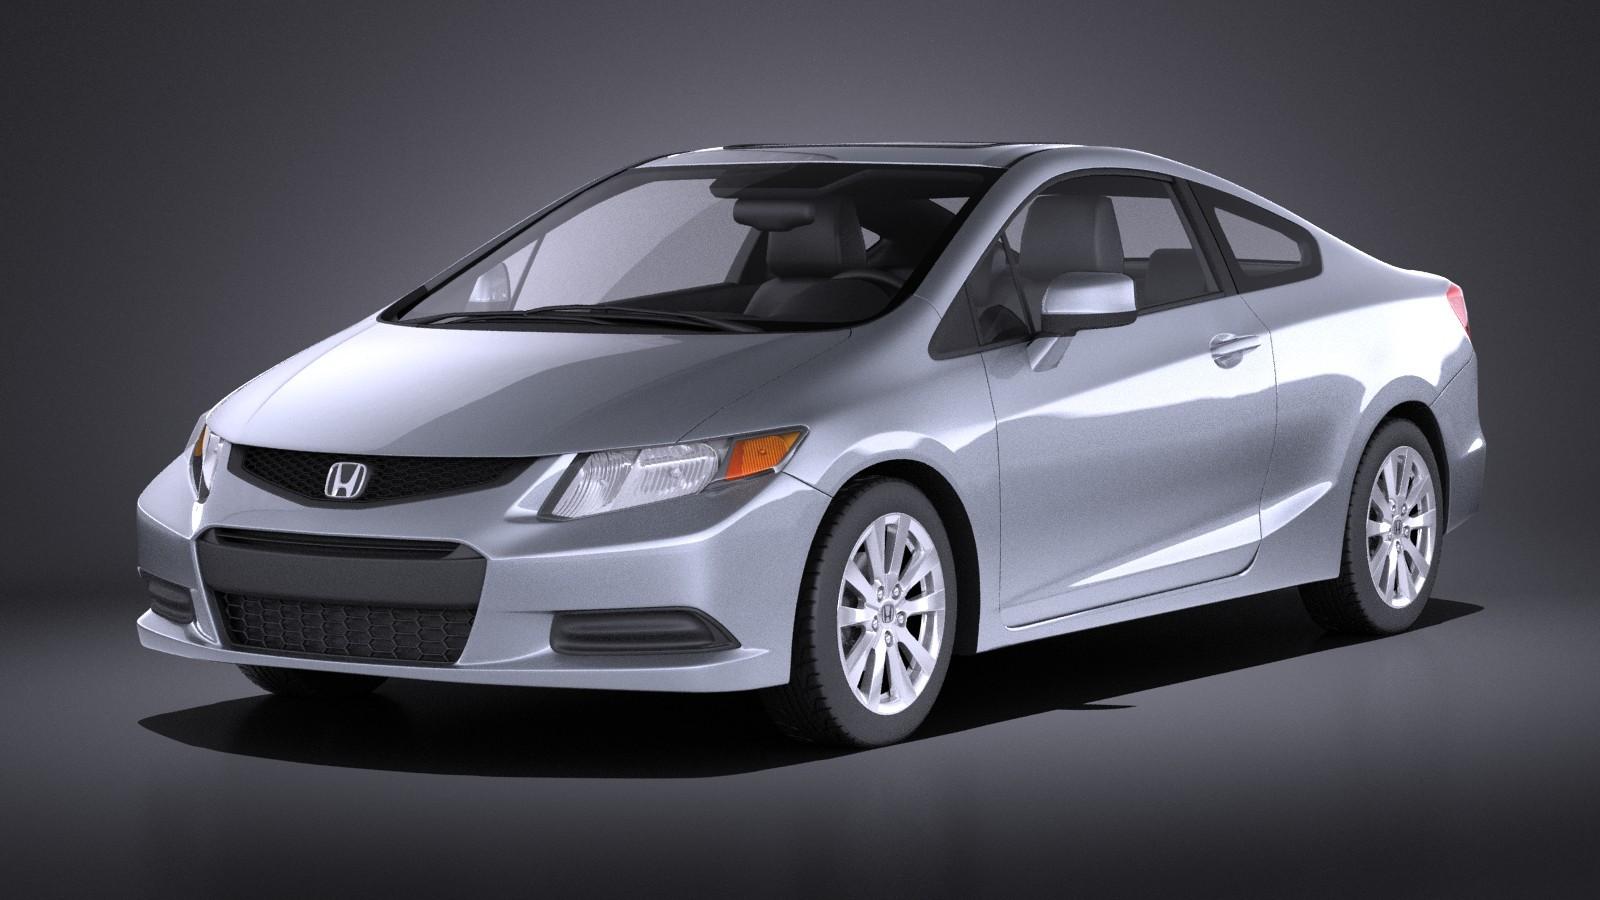 Honda Civic 2013 Usa Coupe VRAY